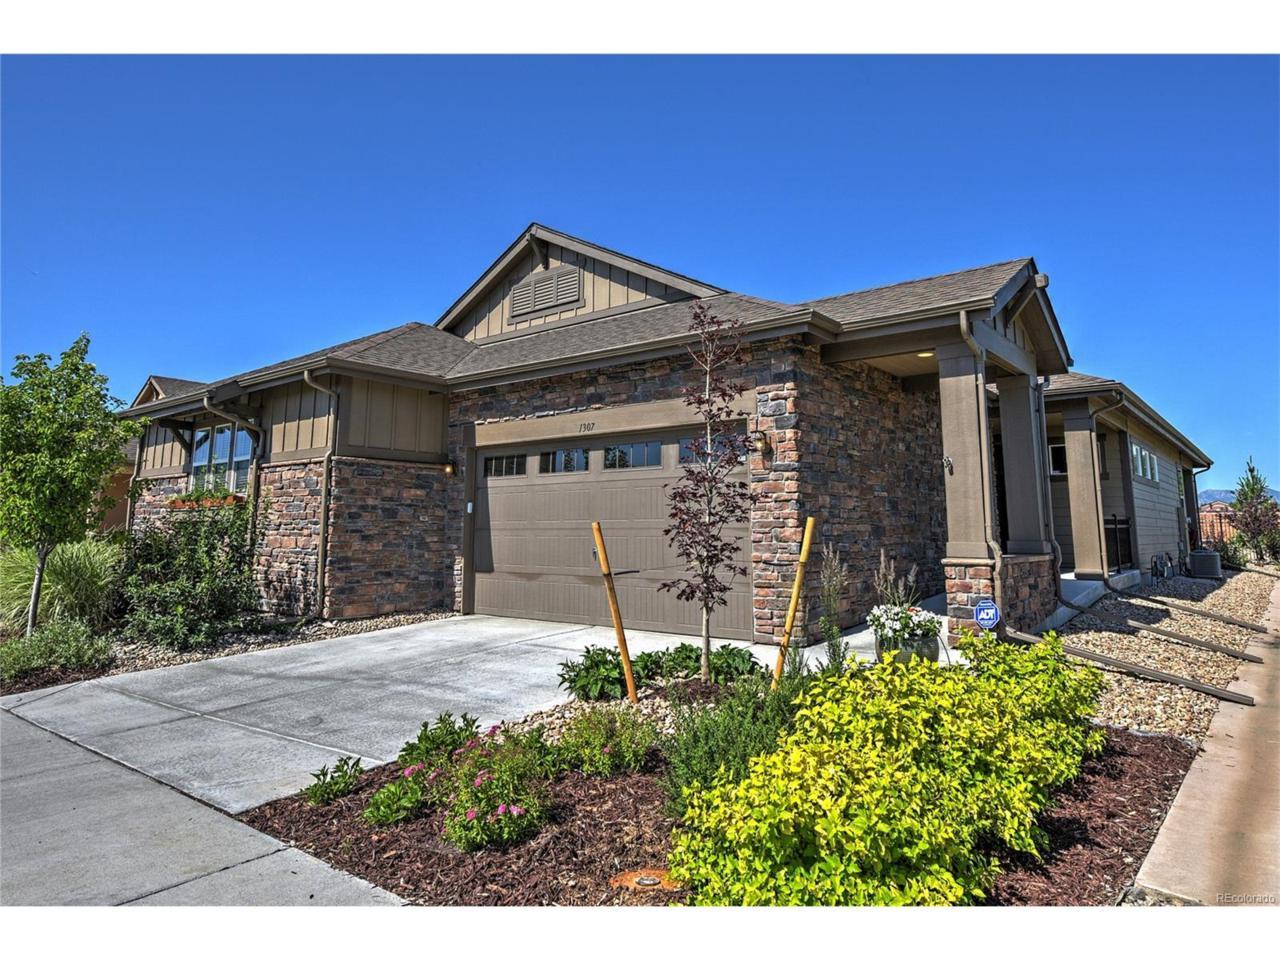 1307 Lander Lane, Lafayette, CO 80026 (MLS #8973495) :: 8z Real Estate